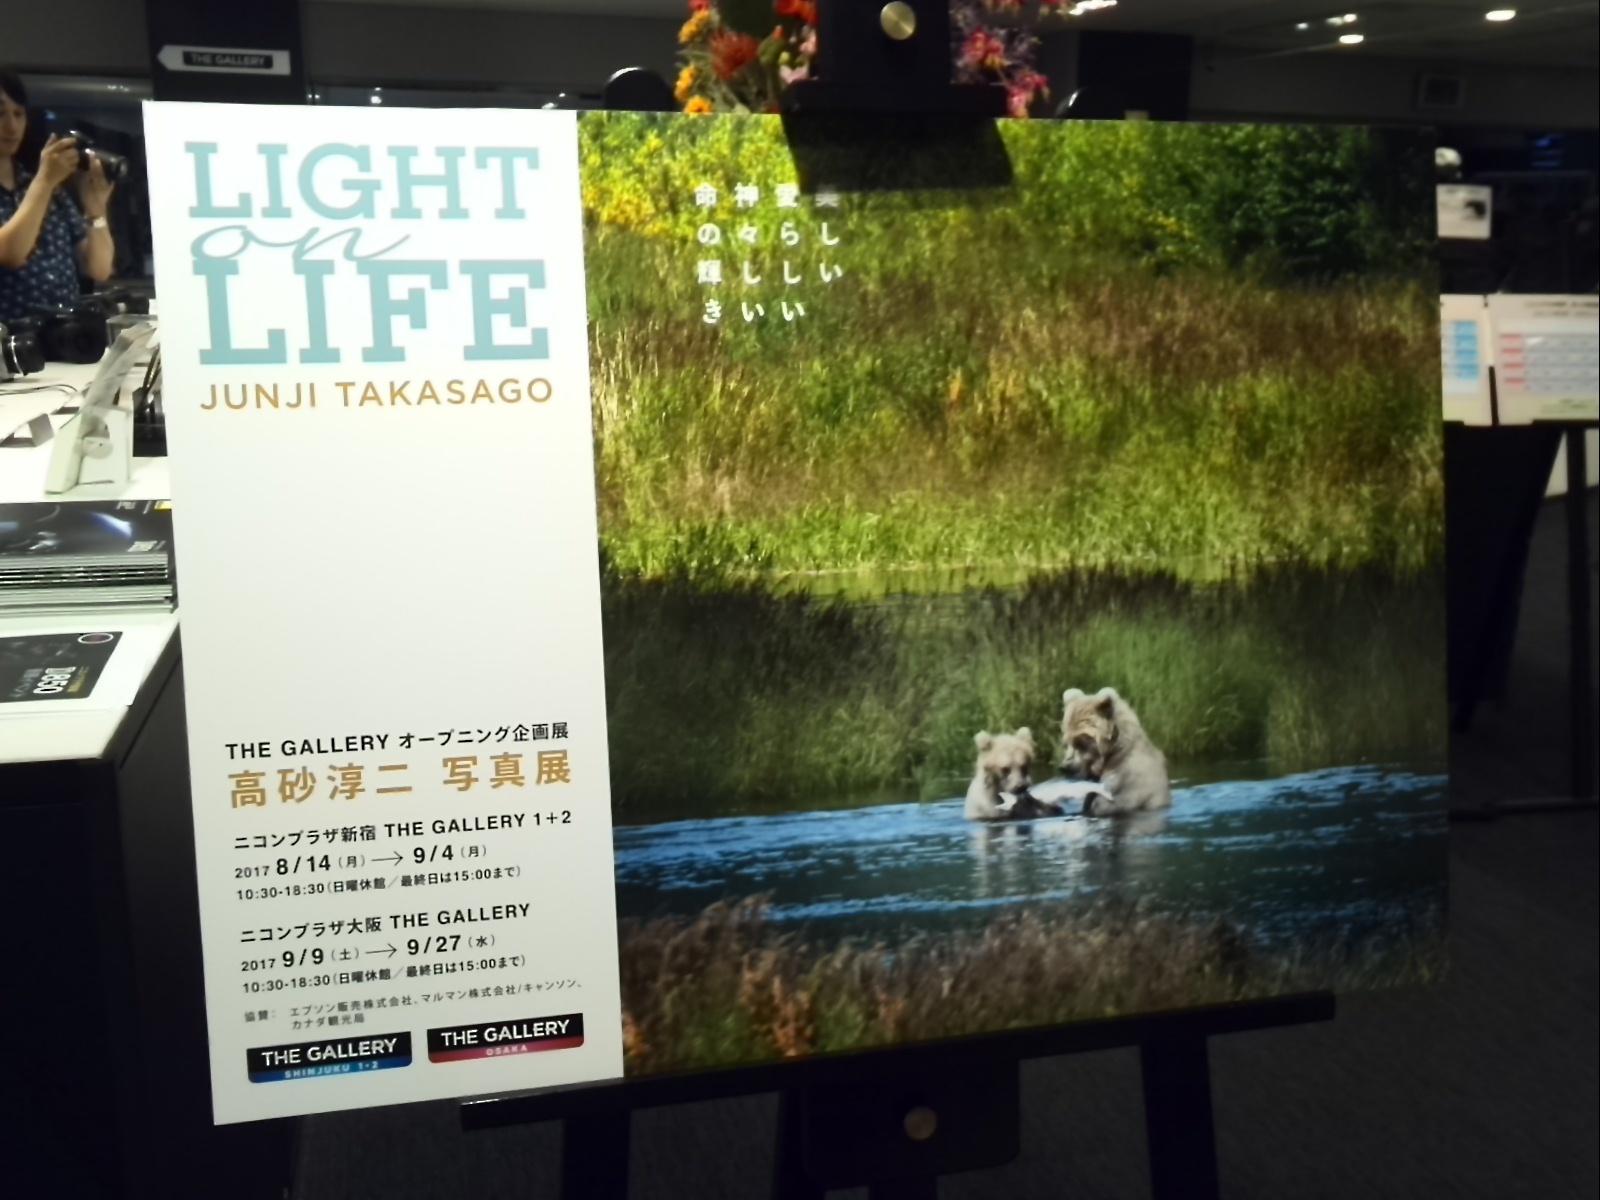 #atelierフォルマーレにてセミナー #高砂淳二写真展 #赤坂おもてなしビアガーデン!_f0340942_23272904.jpg